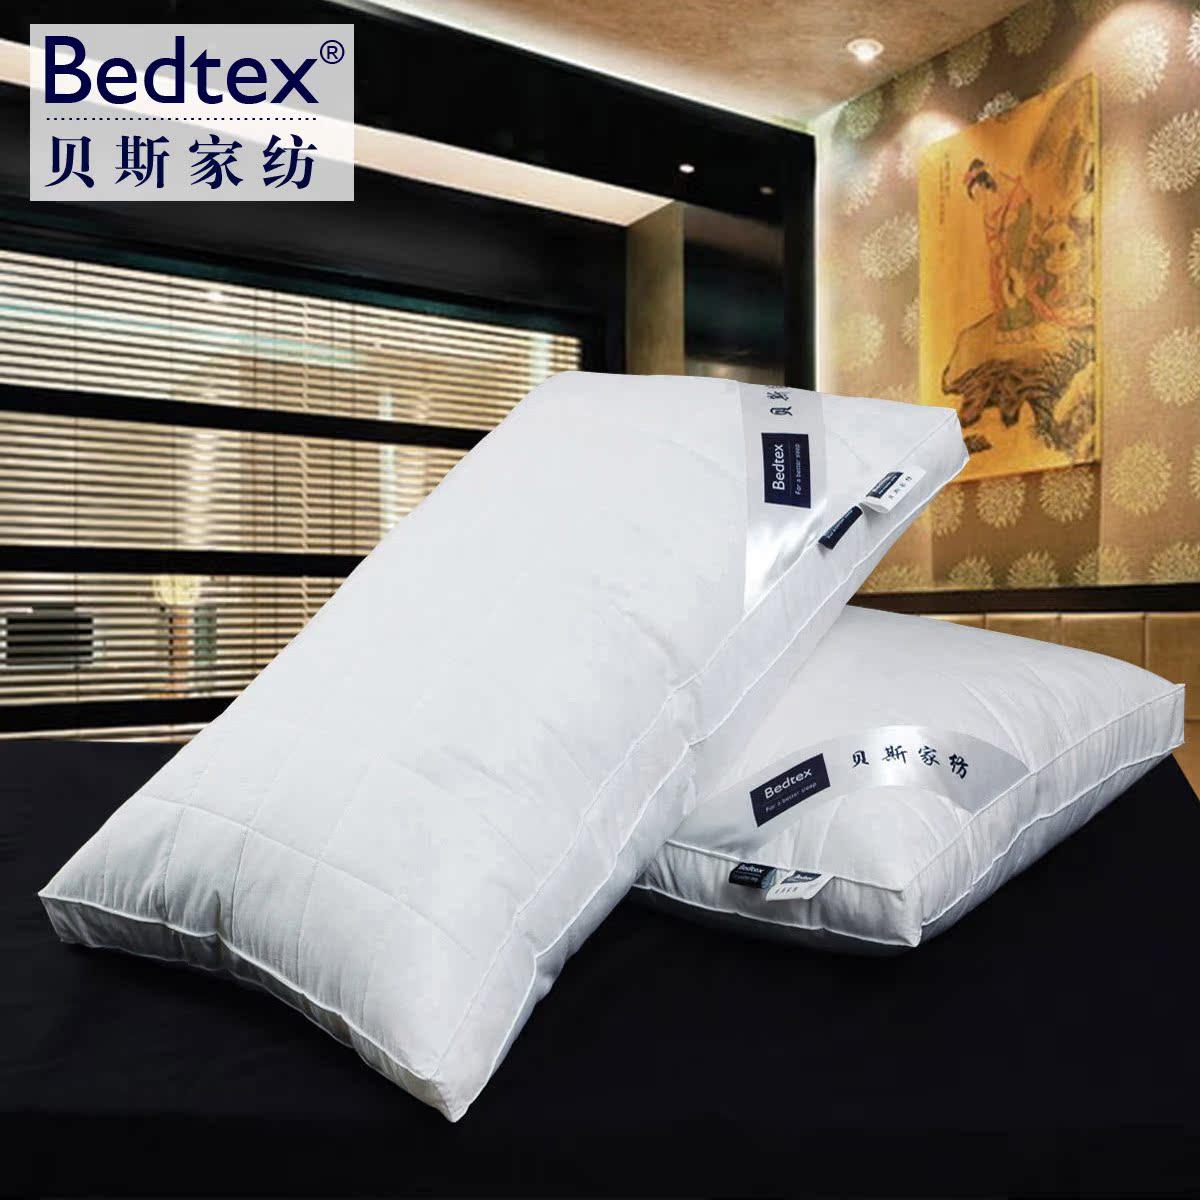 5 звездочных отелей вниз подушки Bedtex перо подушки подушка стерео технологии памяти Sony палку USB